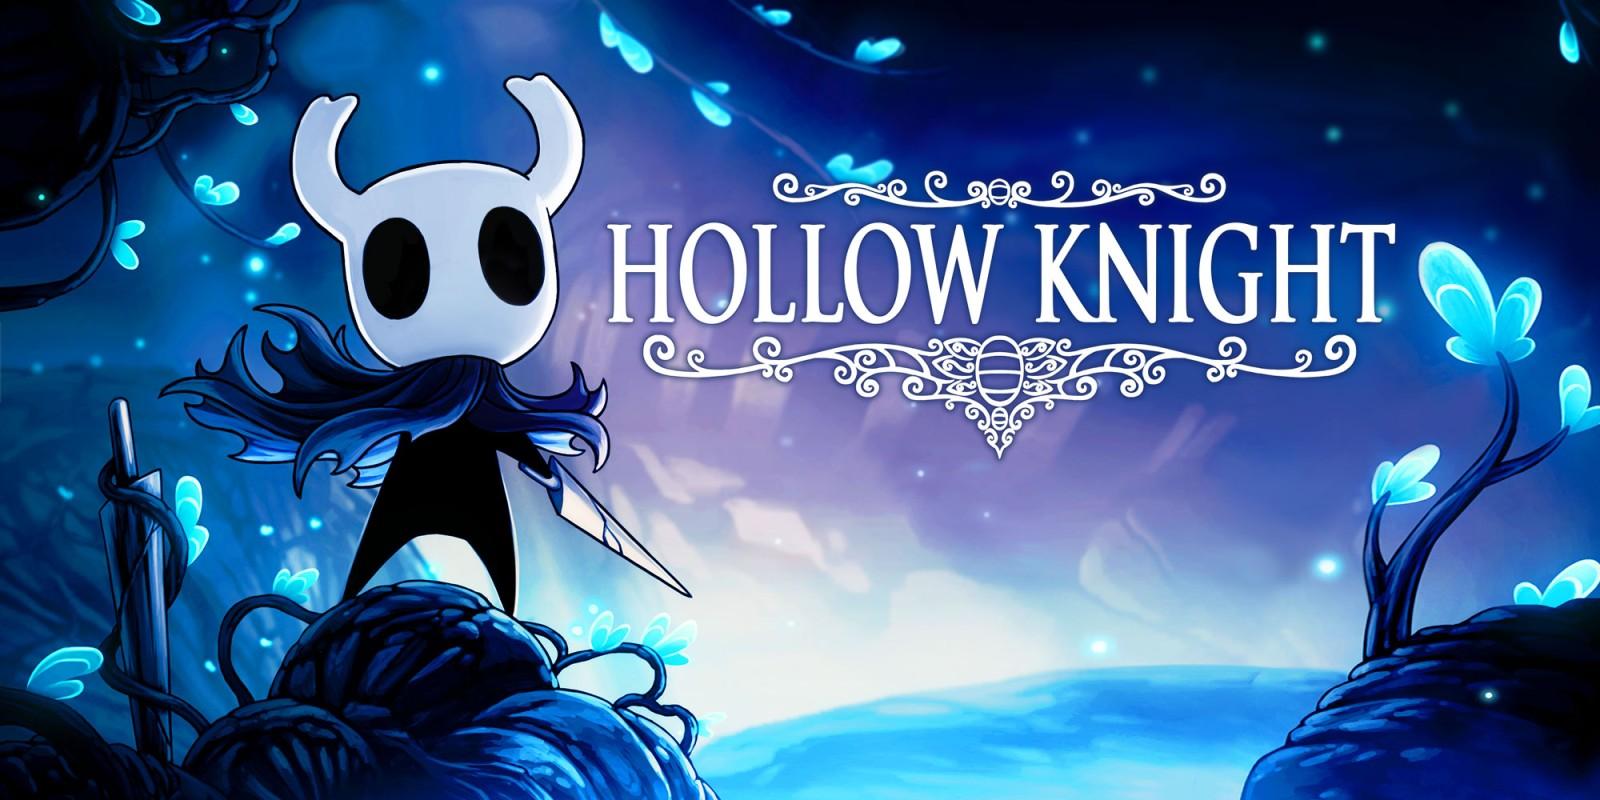 hollow knight review juli 2019